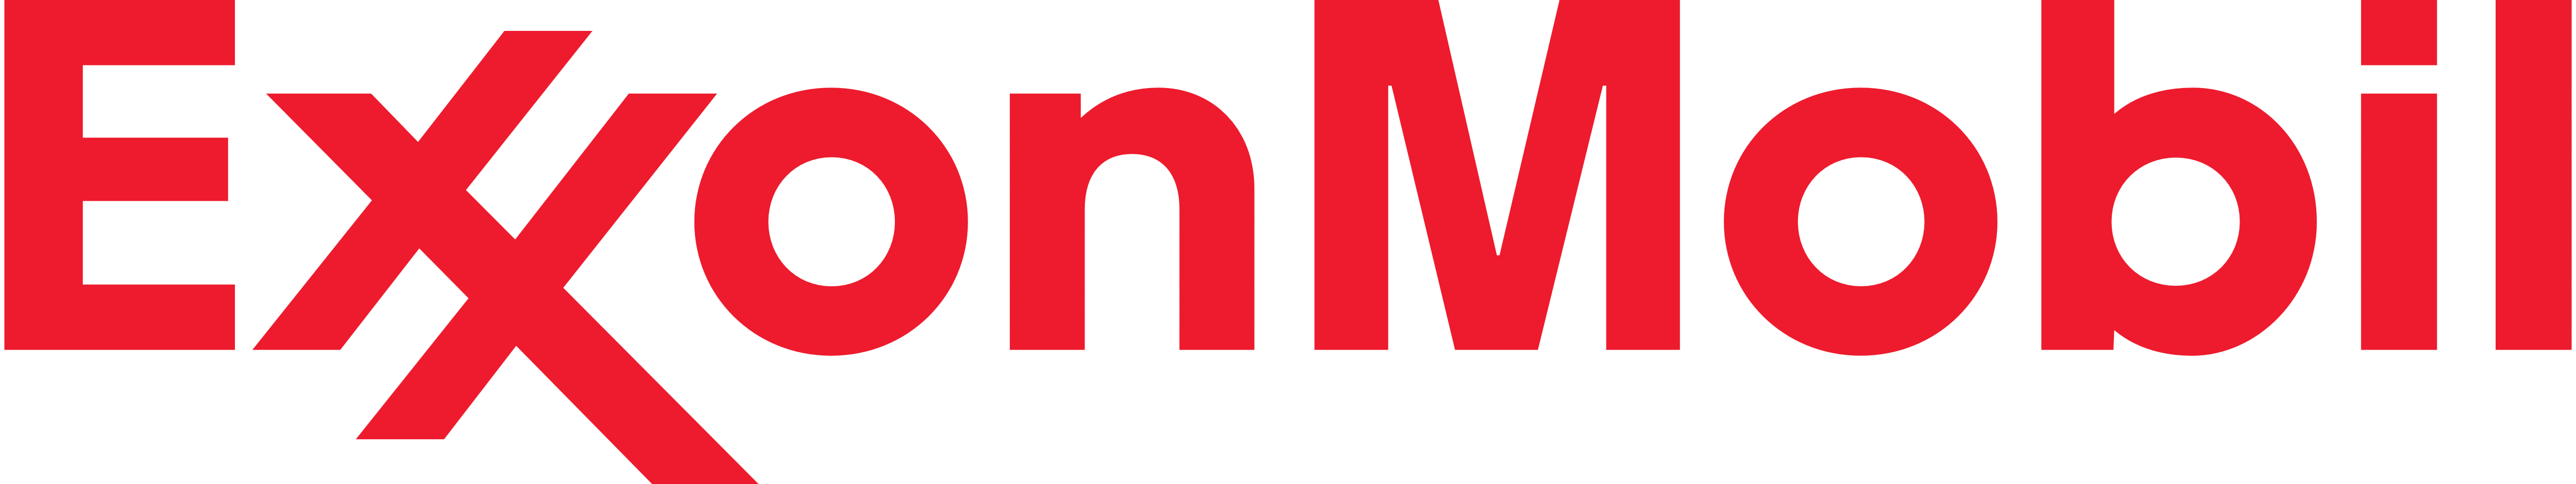 exxon � logos download